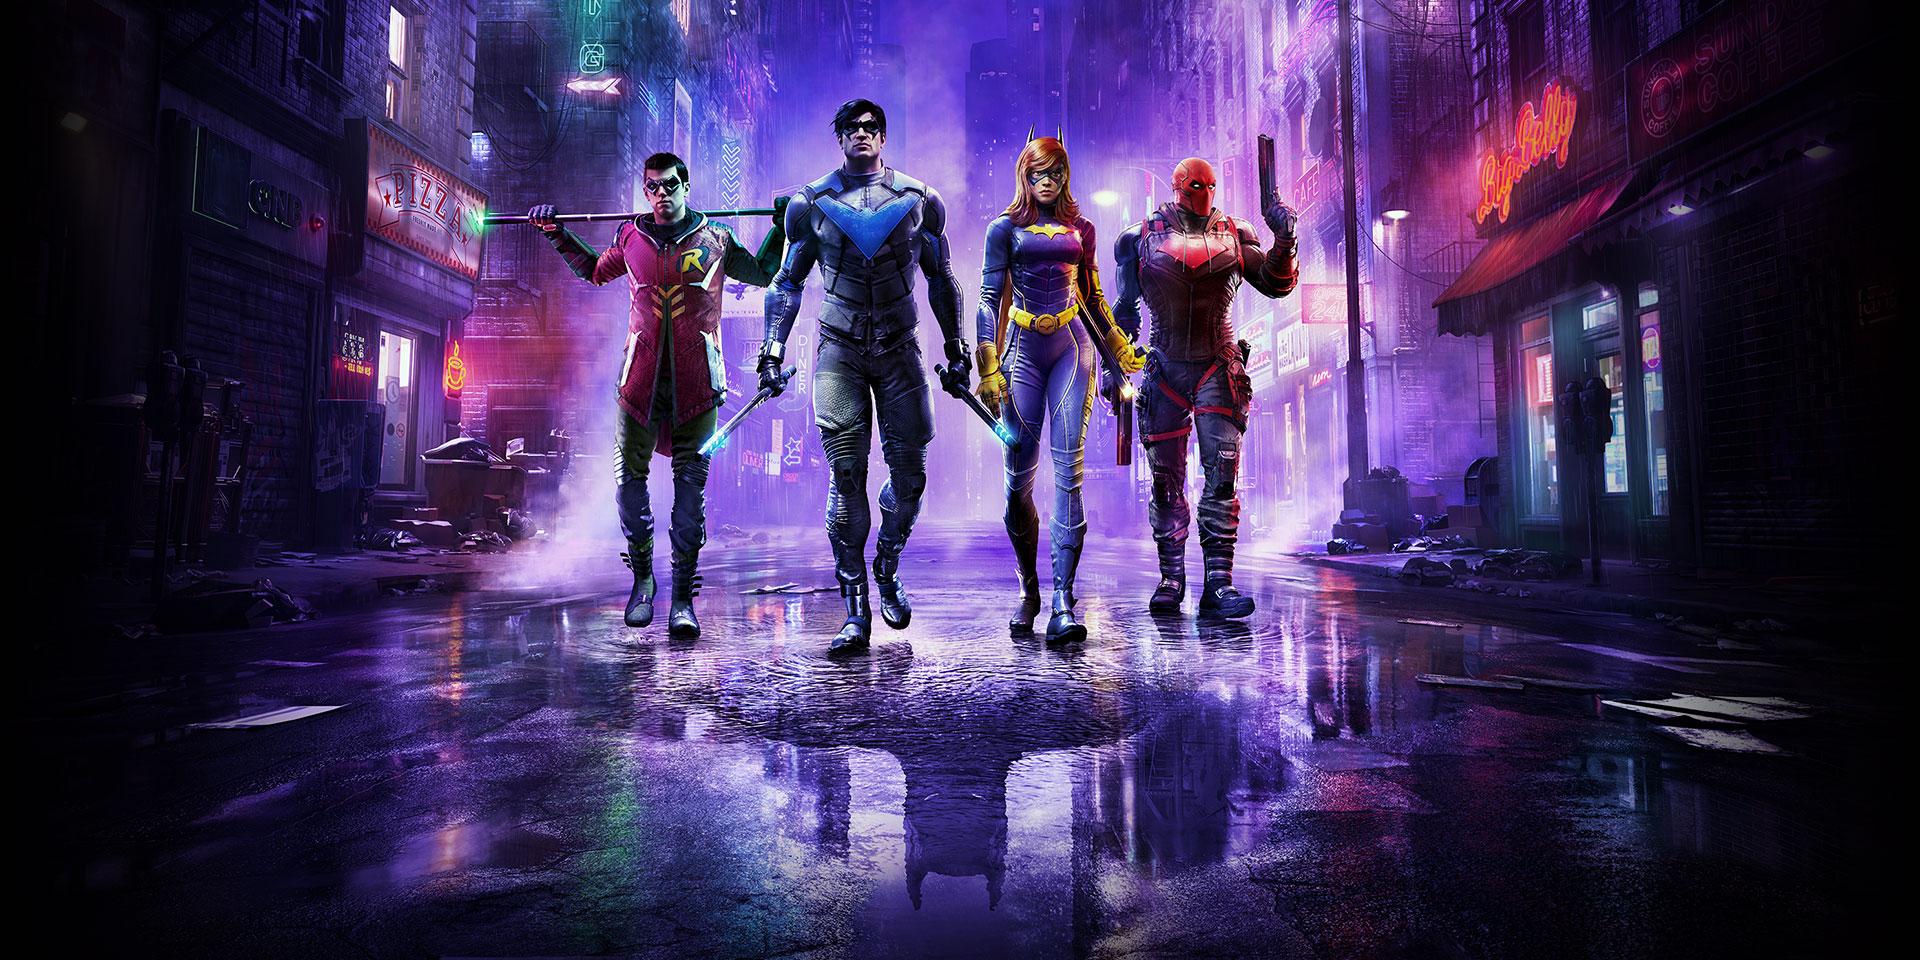 Robin, Nightwing, Batgirl and Red Hood